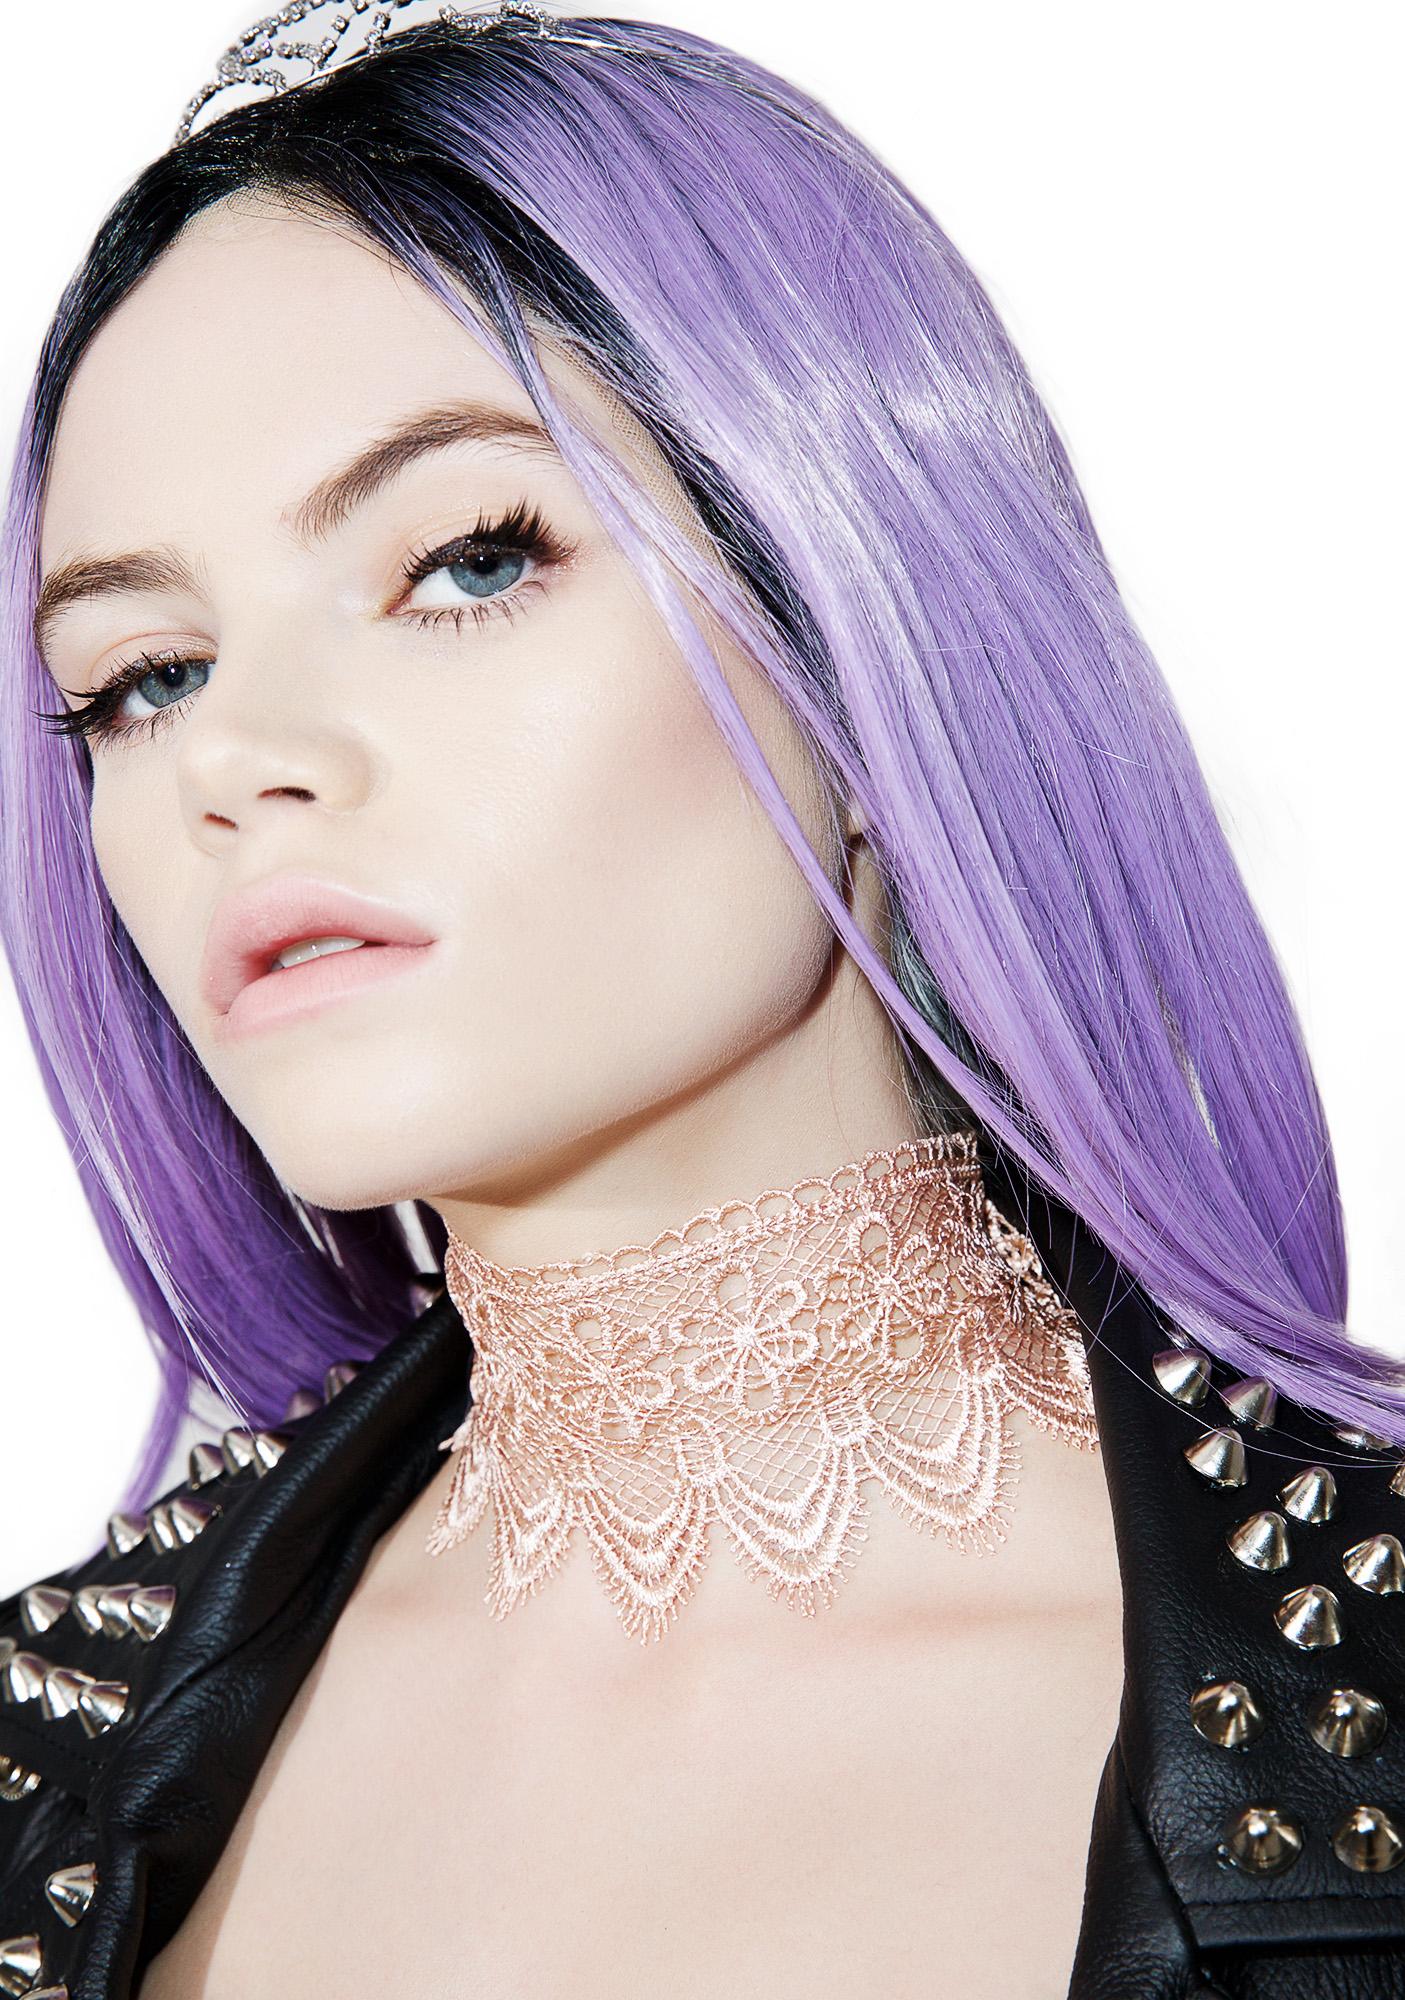 Cream Eyelet Lace Choker